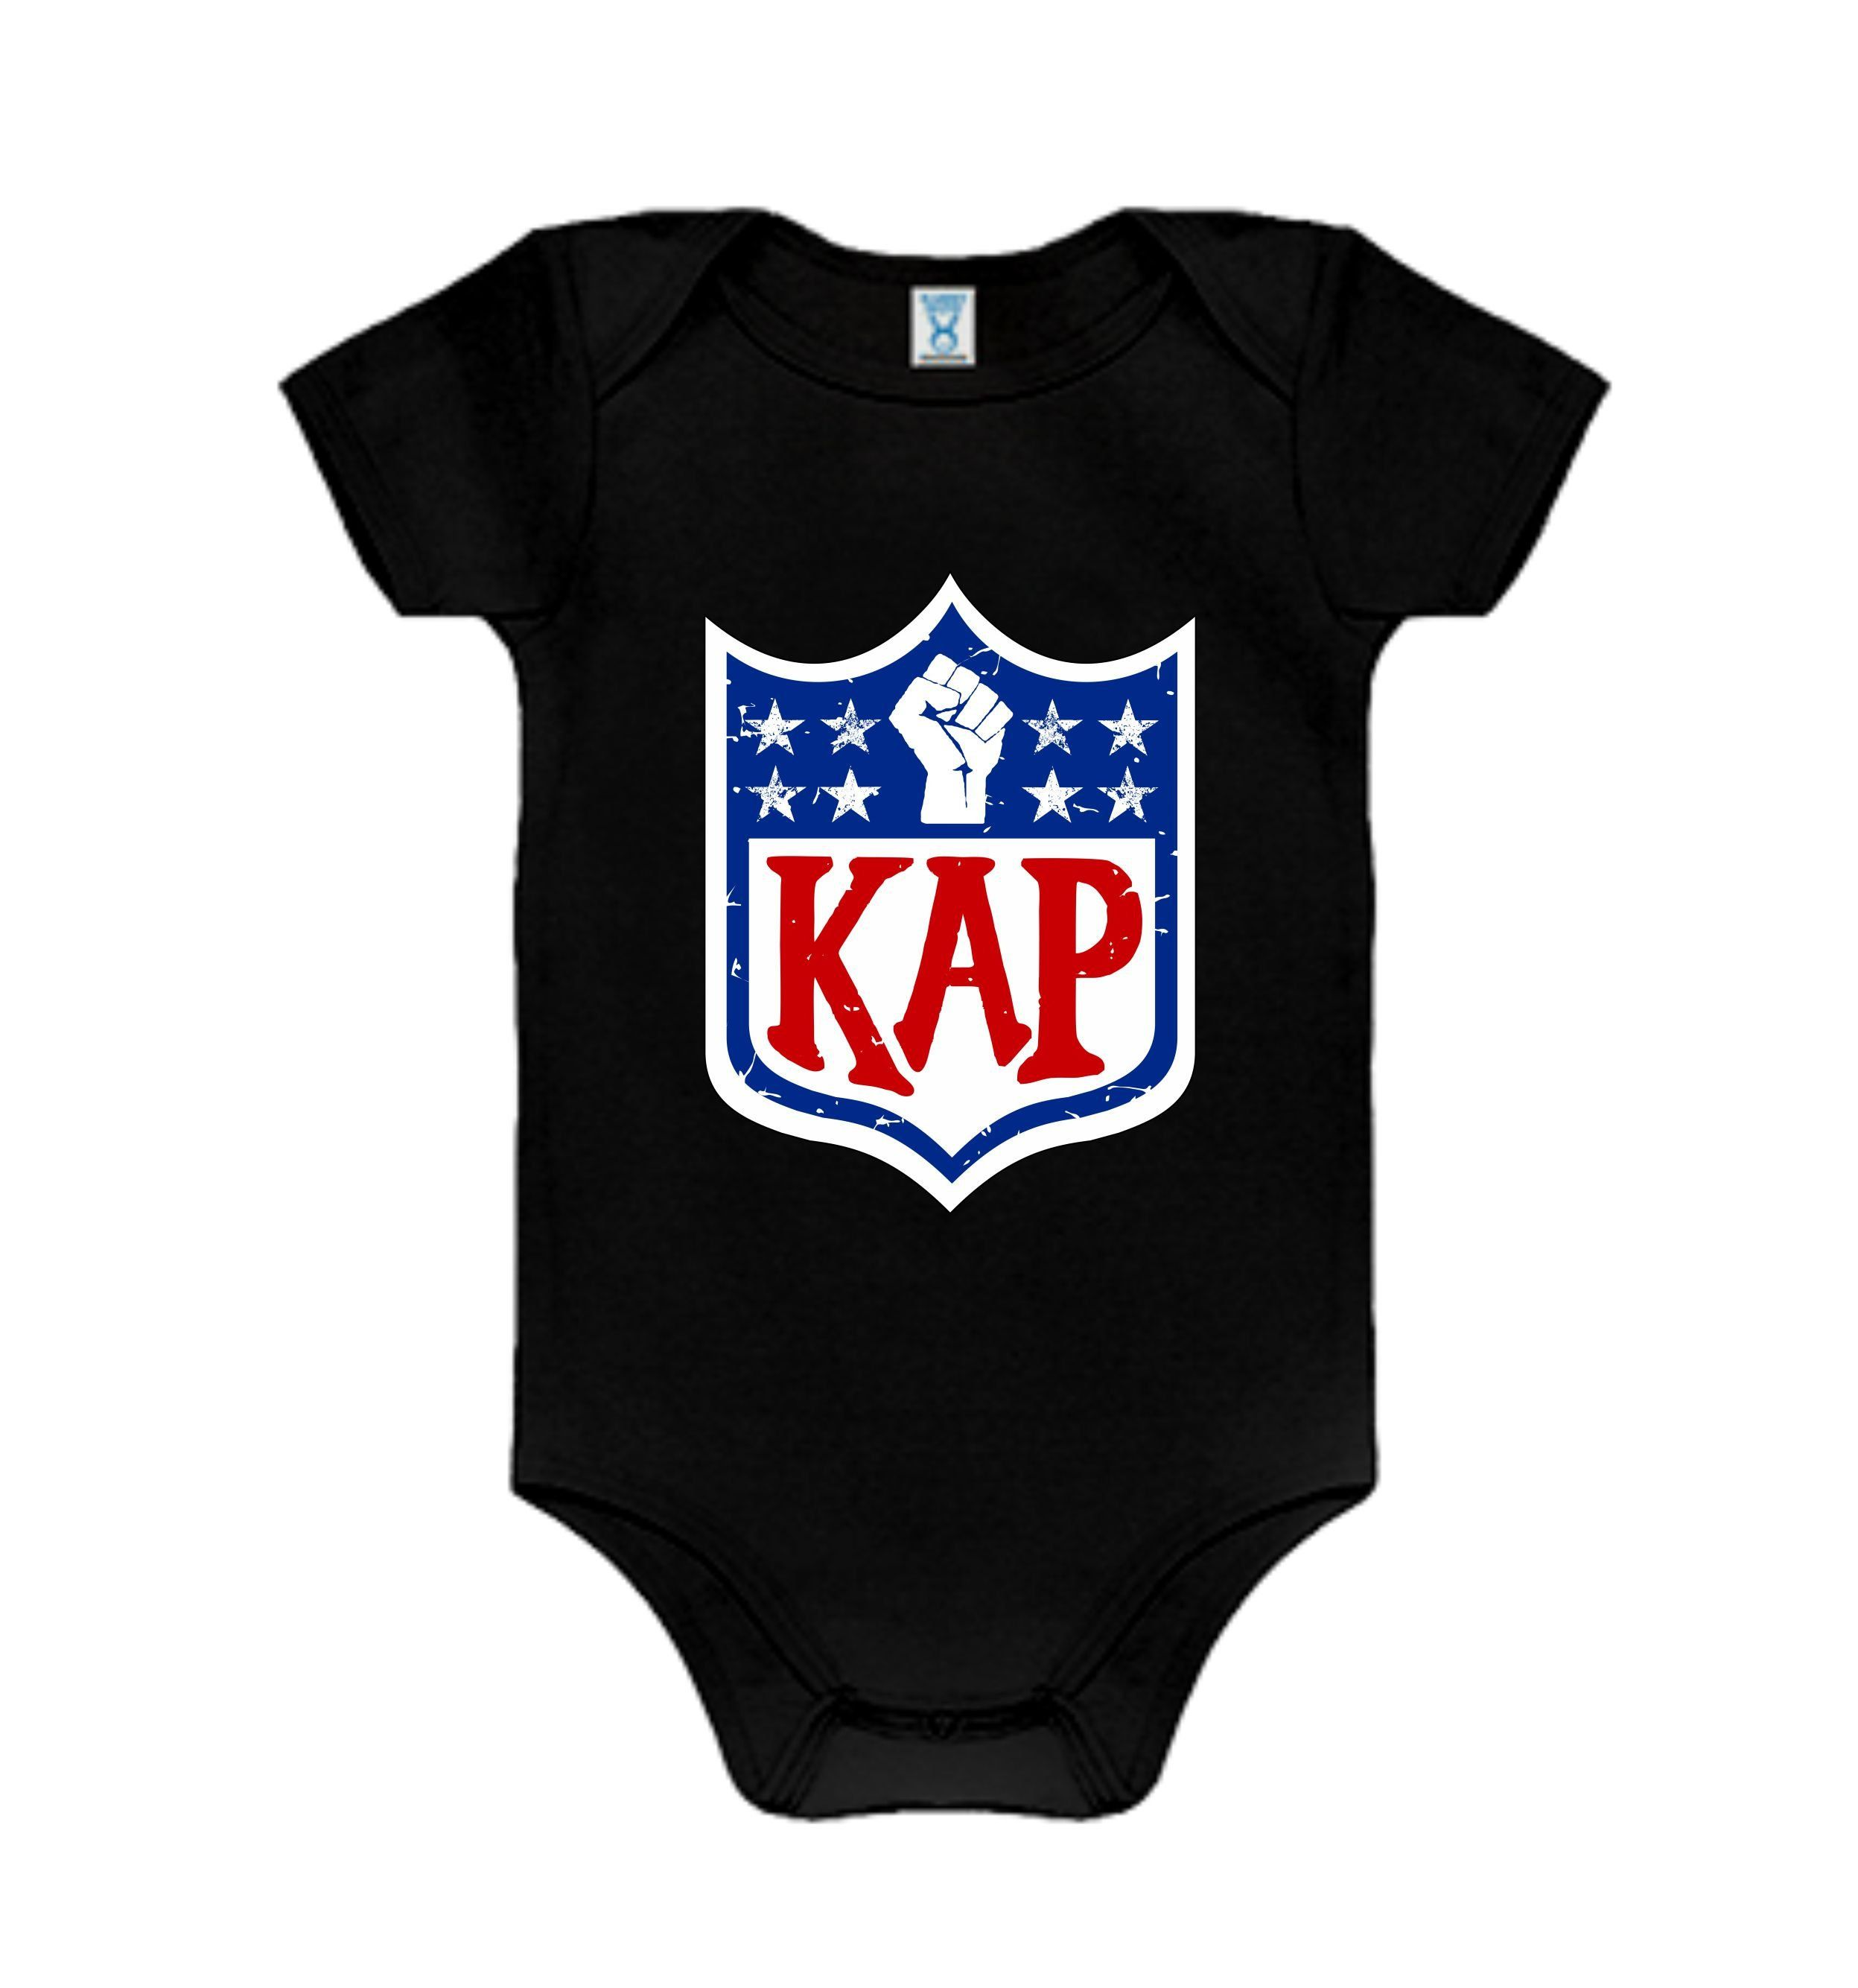 9edefcb06 Colin Kaepernick Kap NFL shield Inspired Graphic Onesie by AtlantasOwn on  Etsy Colin Kaepernick